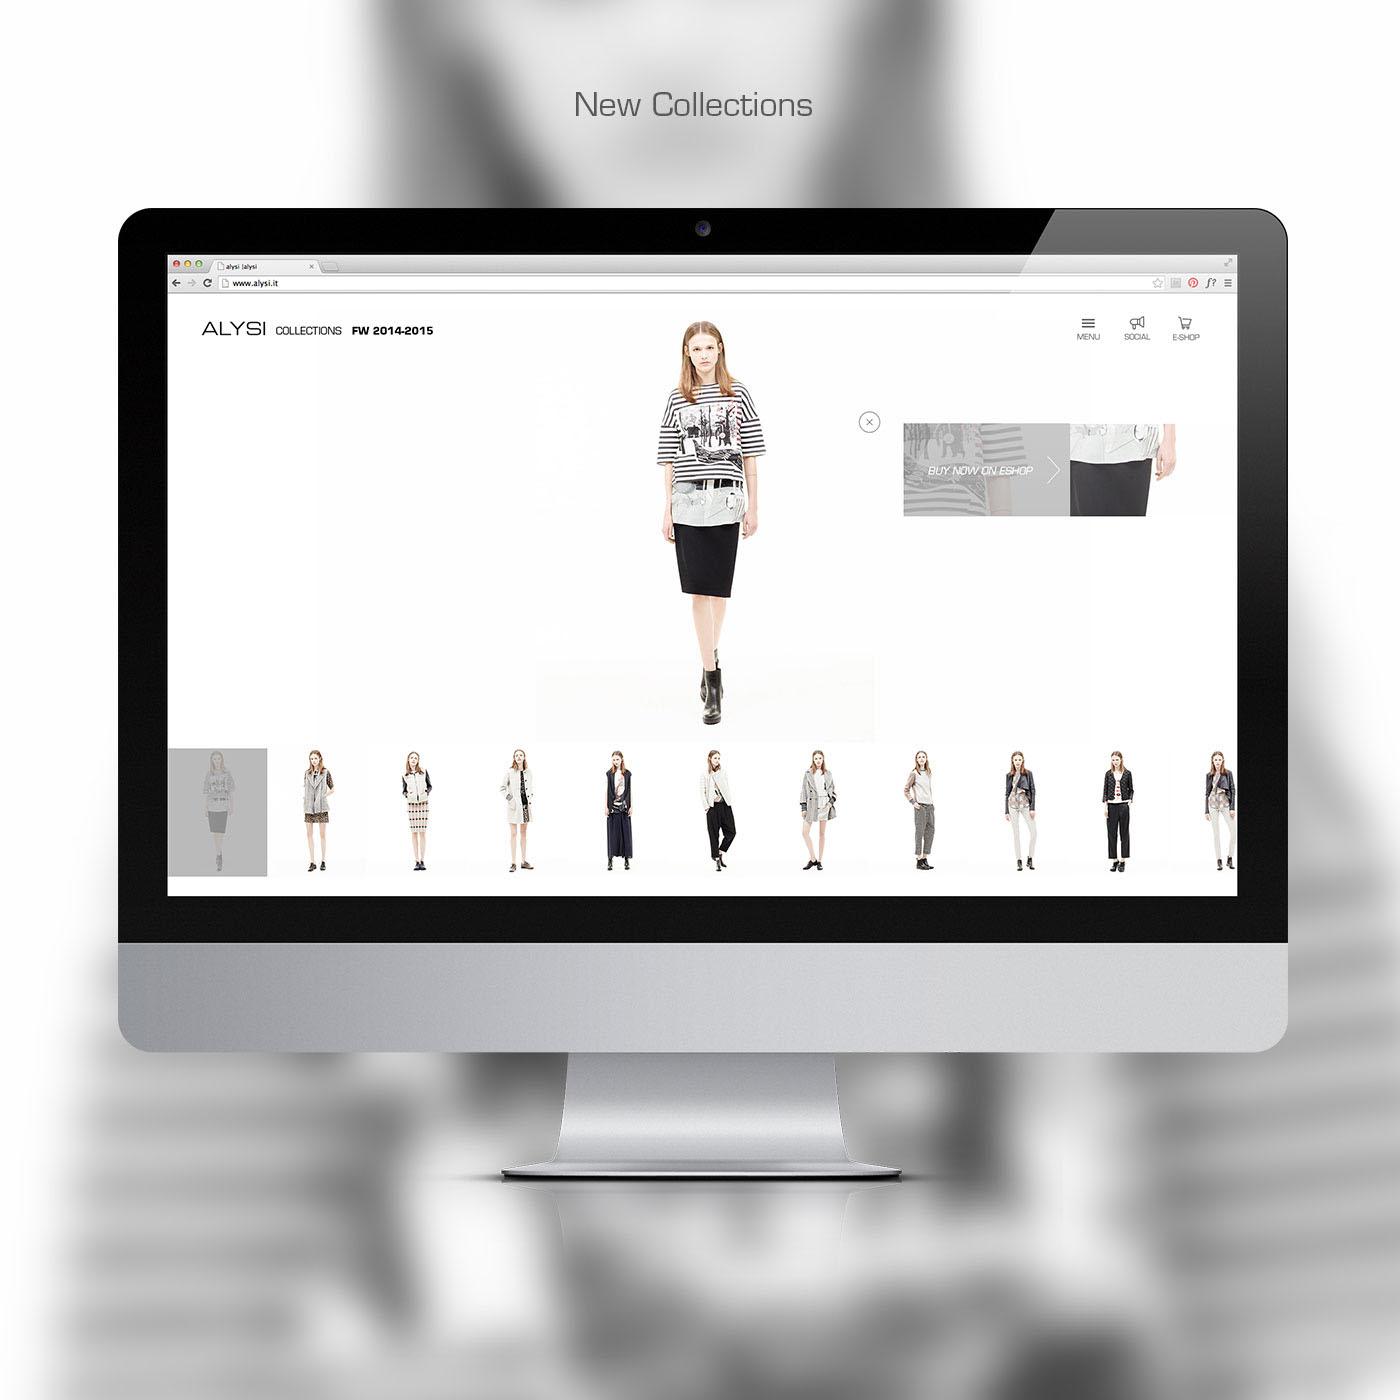 moda Rome Italy Webdesign Responsive White black interactions motion mobile tablet smartphone iphone iPad alysi